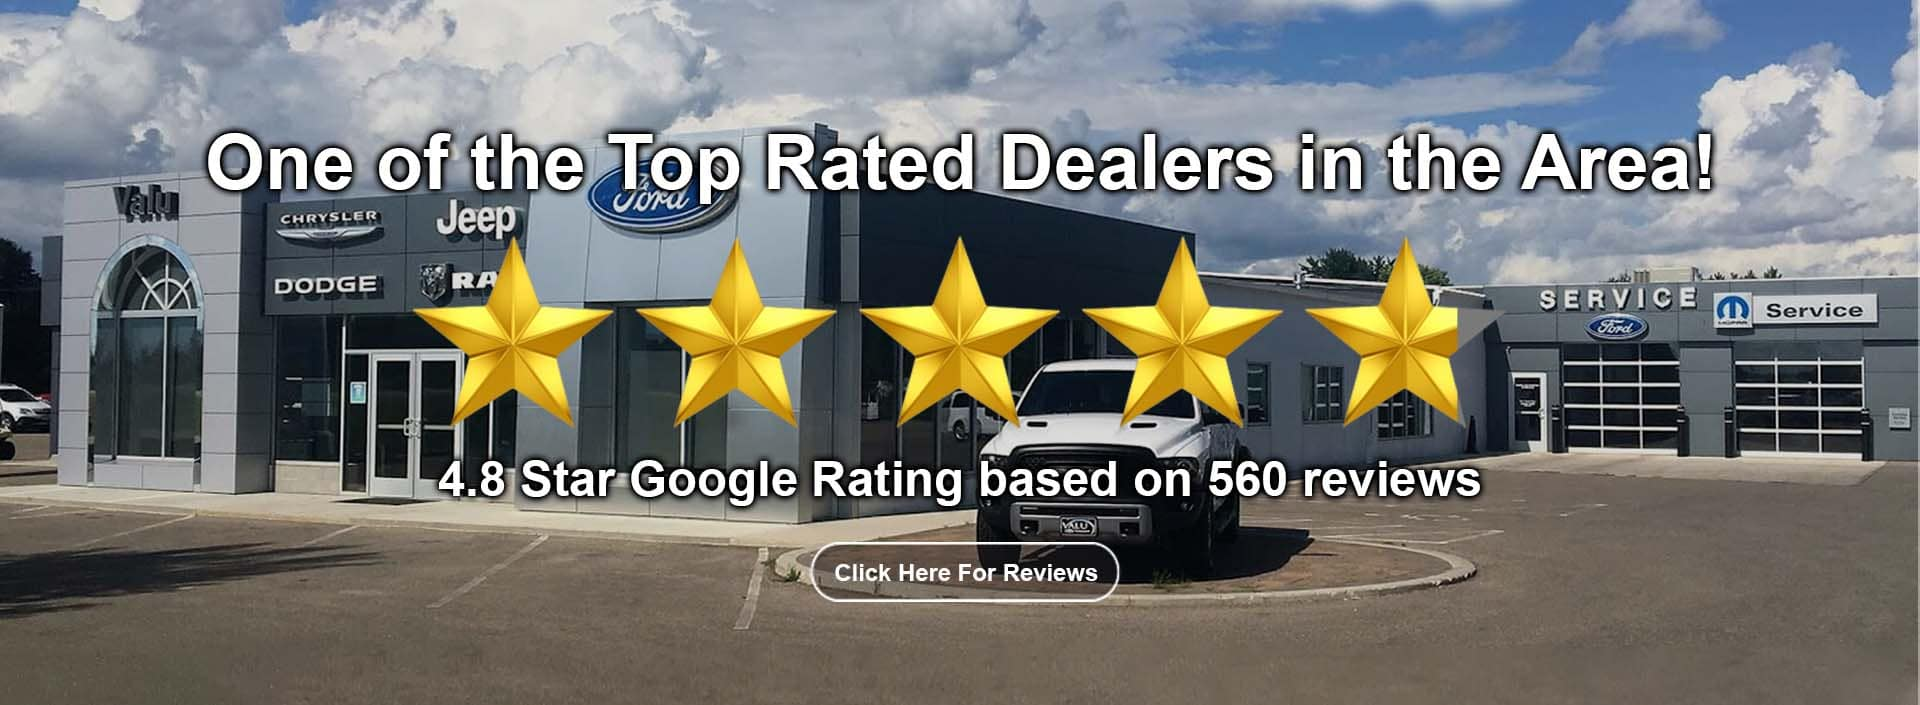 Google_Rating